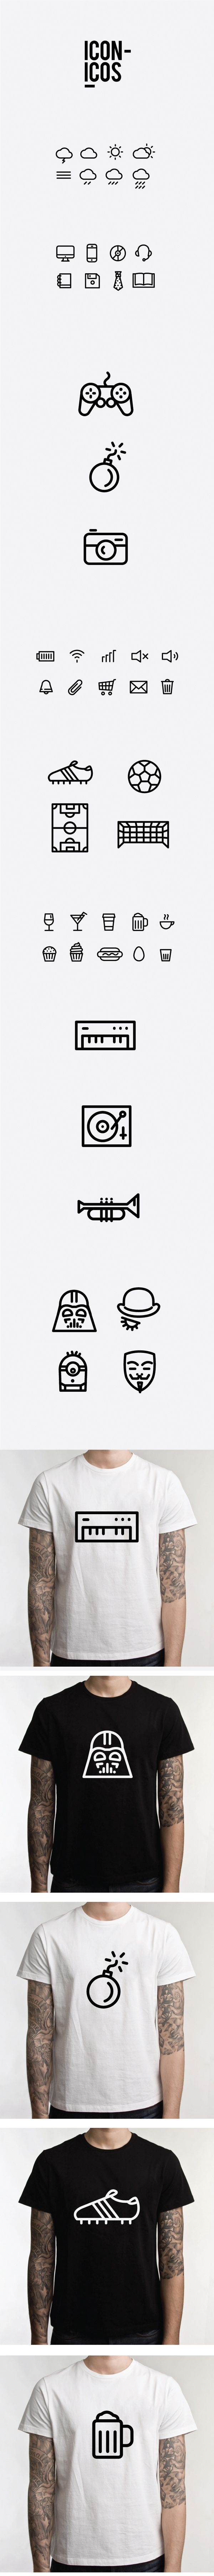 ICONICOS by Adrián Heras, via Behance #Behance @Behance